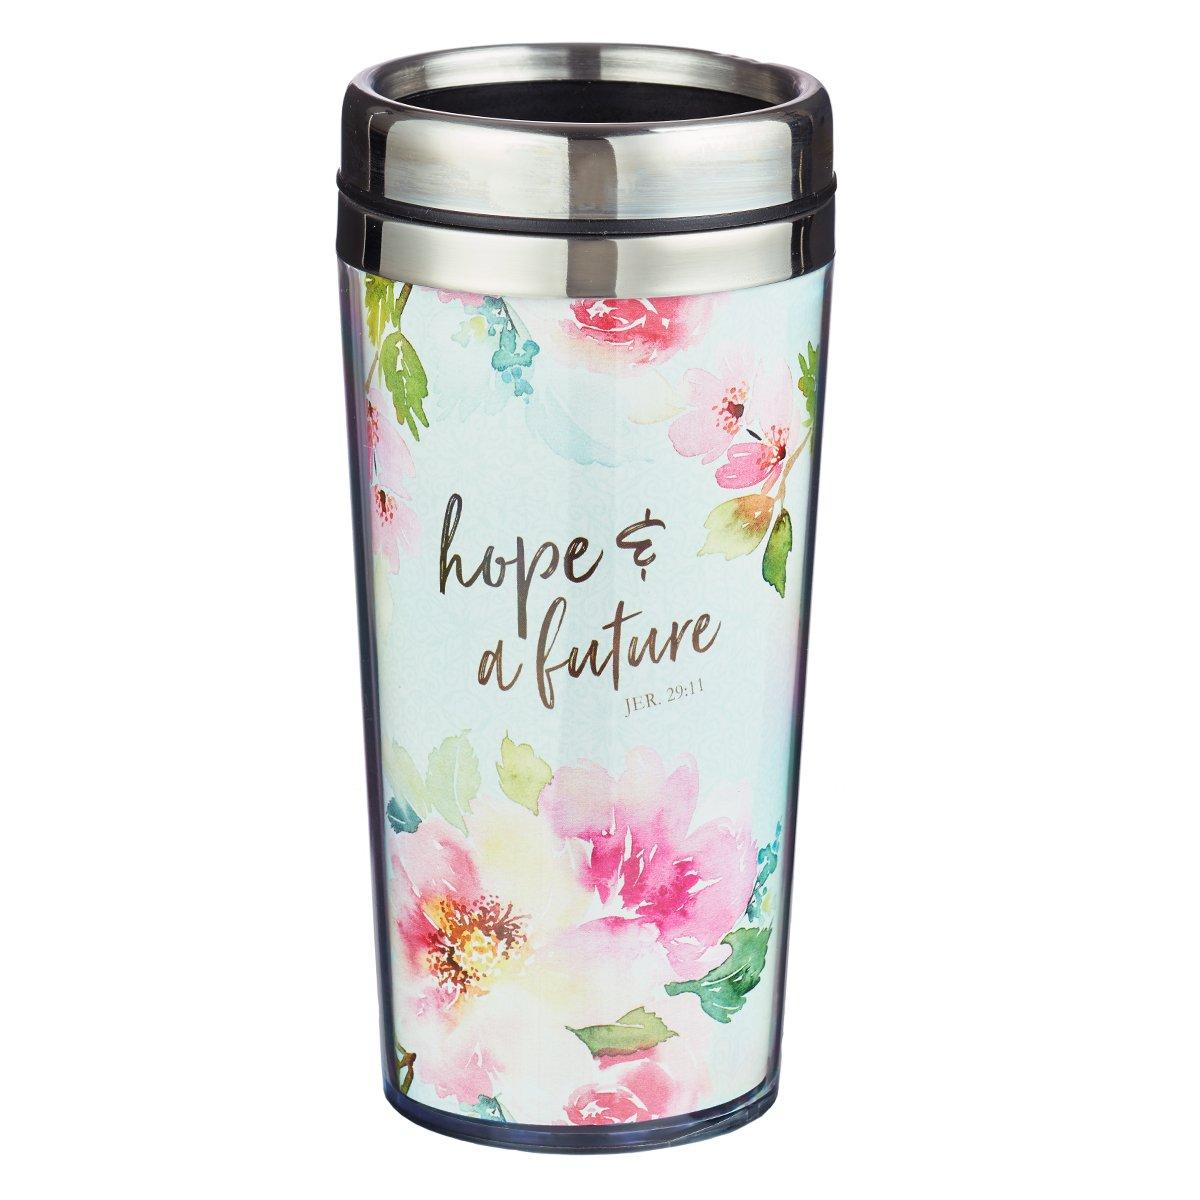 Coffee Travel Mug: Hope and Future - Jeremiah 29:11 by Christian Art Gifts